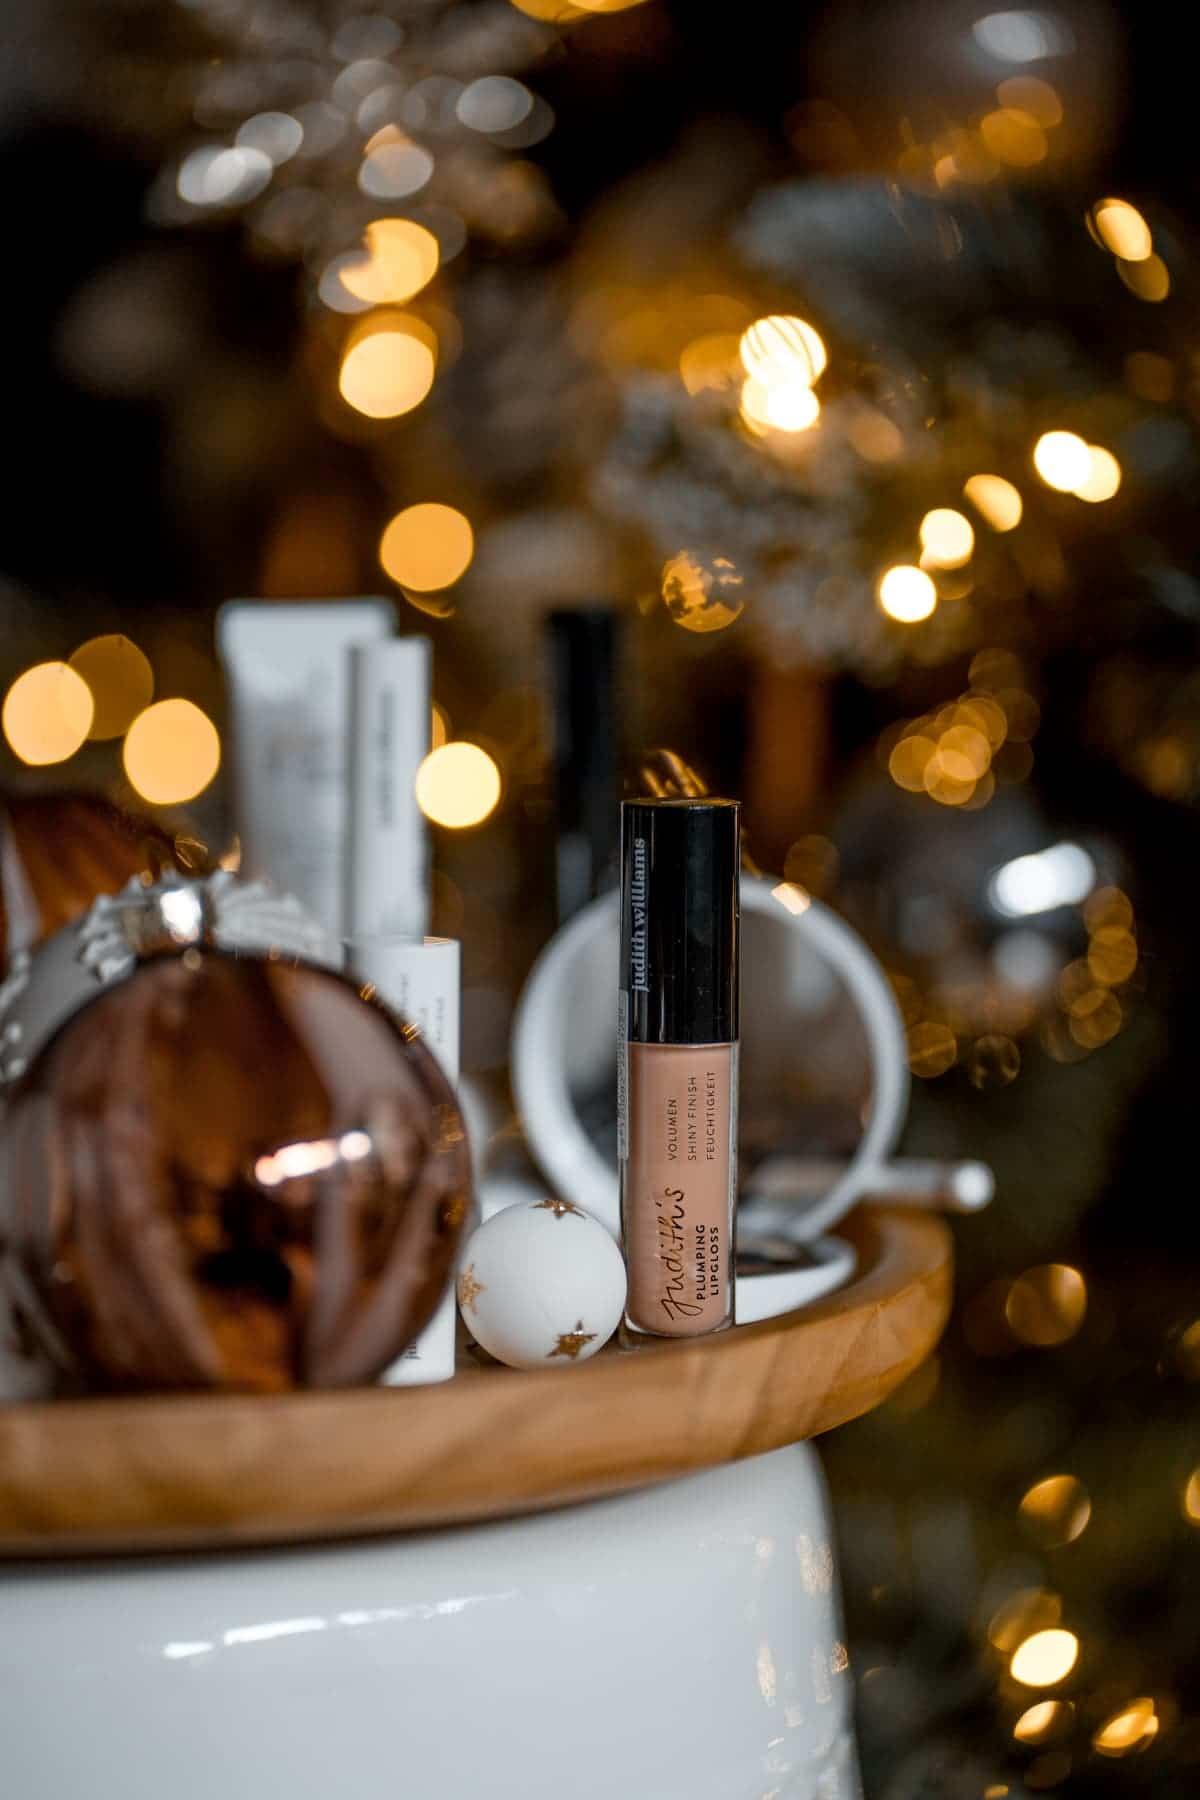 Adventskalender Türchen 16: Judith Williams Kosmetik Paket